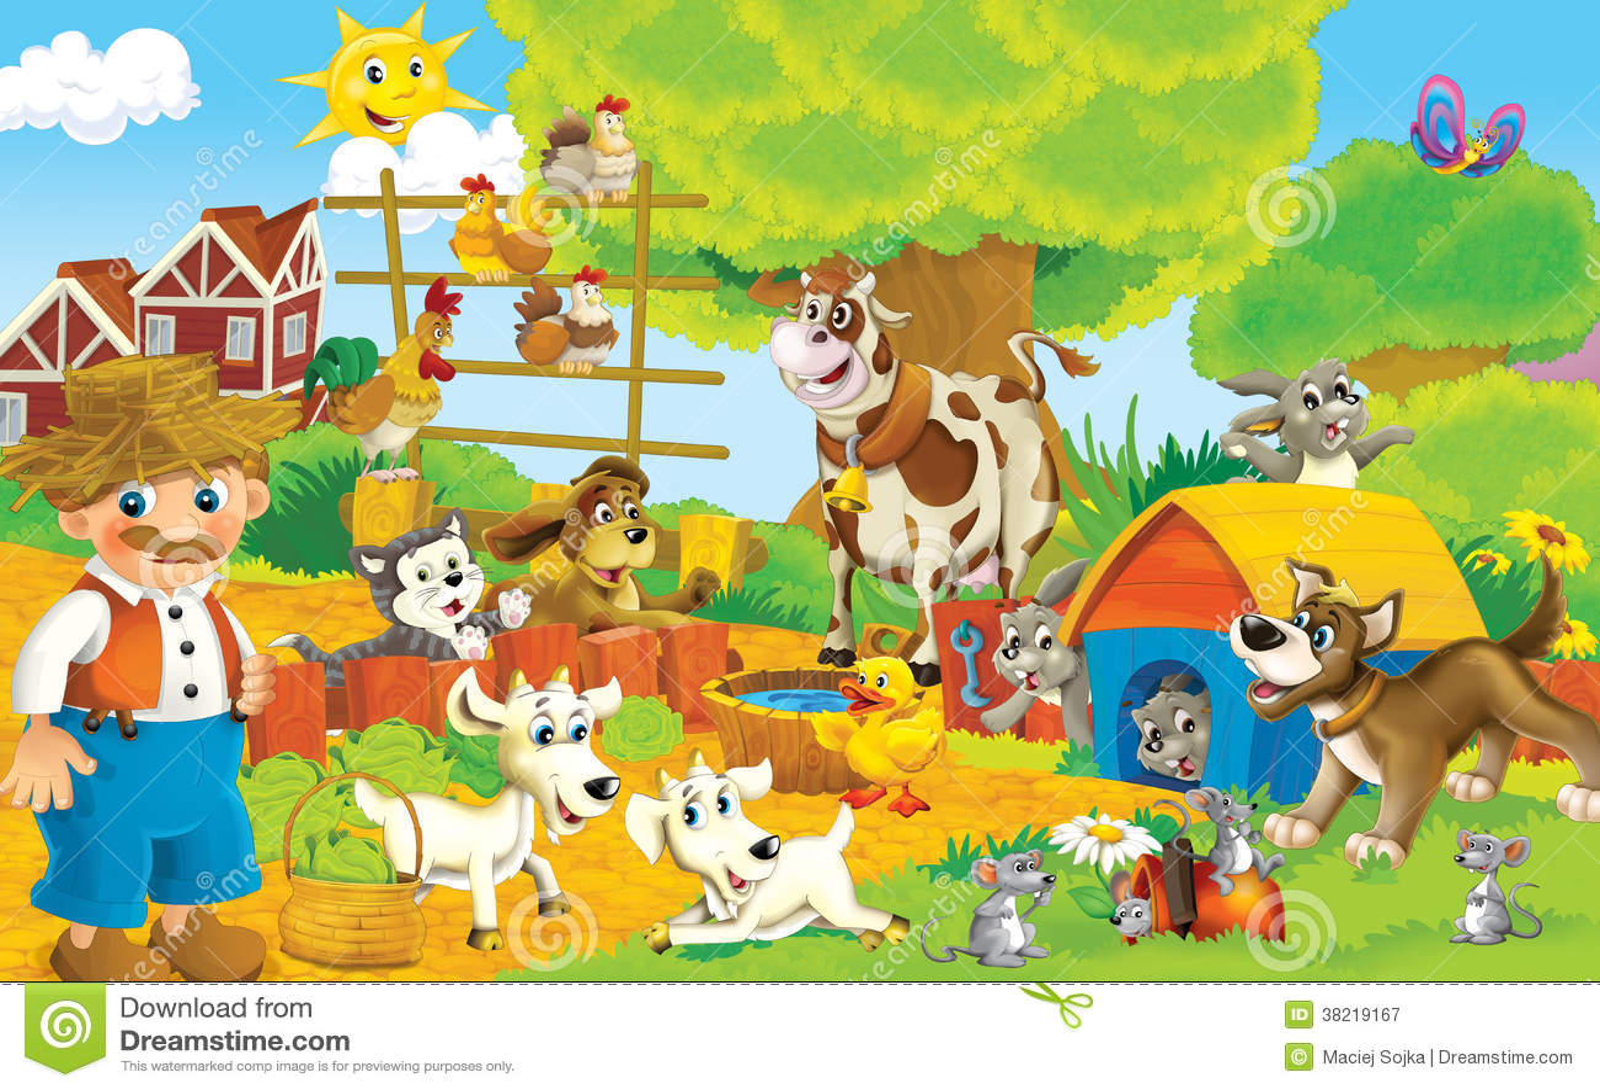 Royalty Free Stock Photography: Cute Cartoon Farm Animals